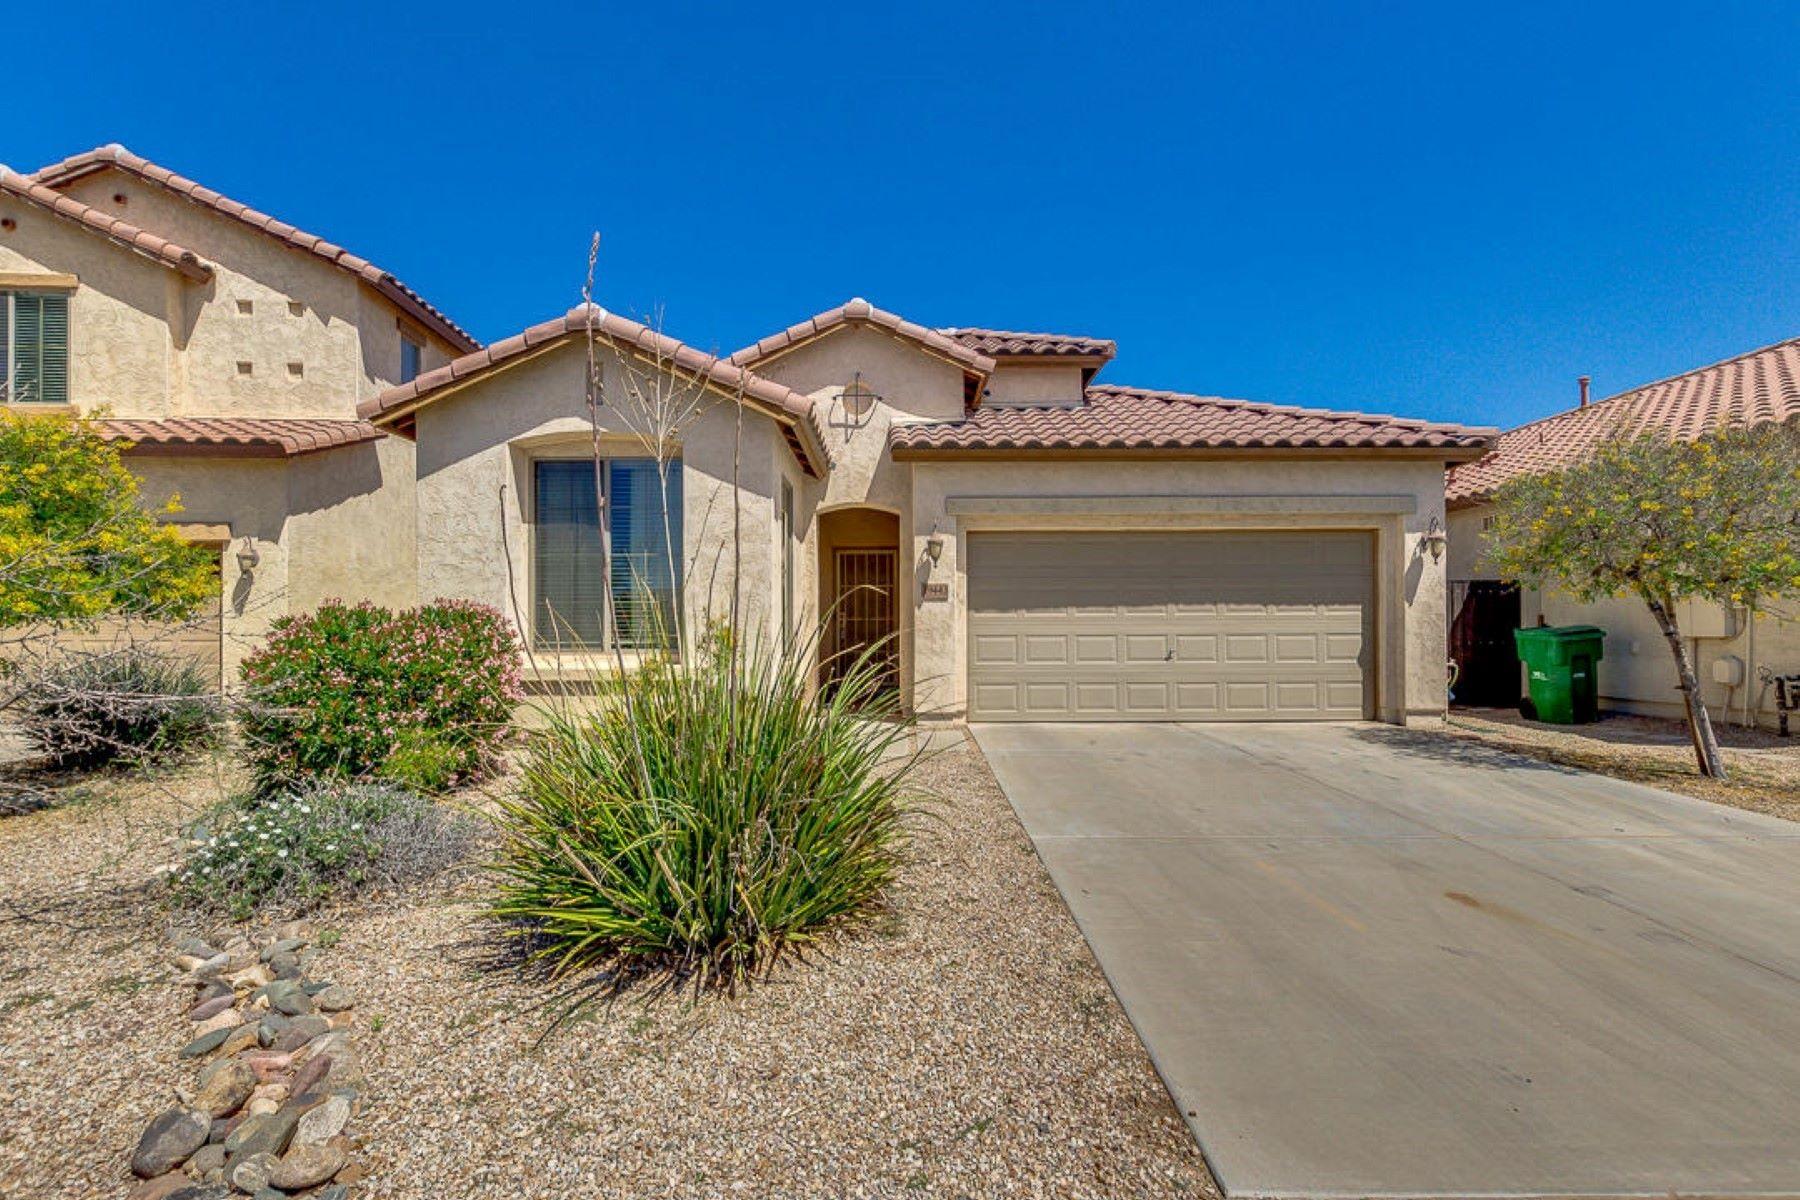 single family homes for Active at Tortosa 19443 N SAN PABLO ST Maricopa, Arizona 85138 United States